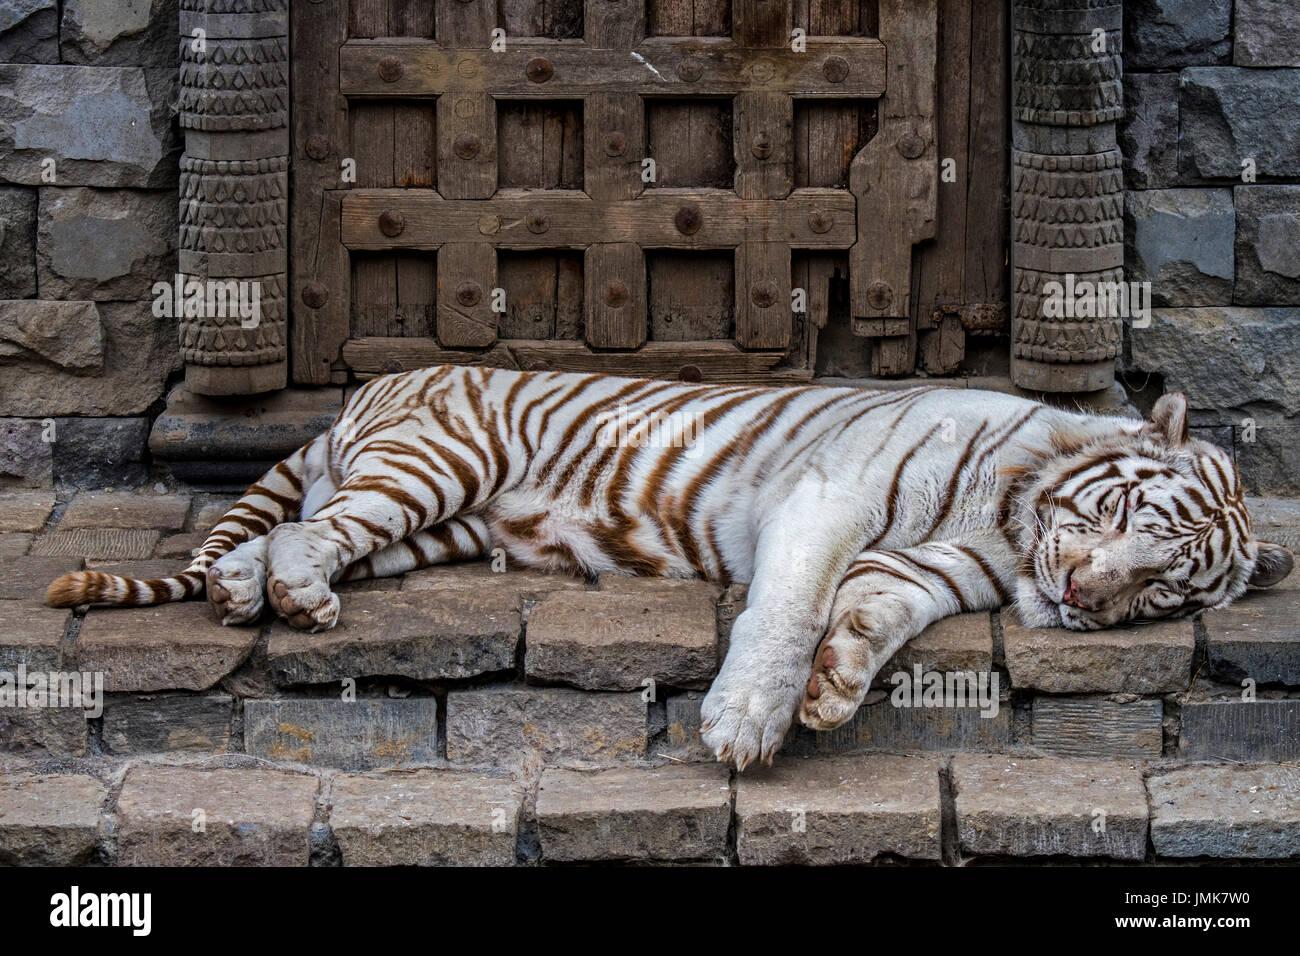 white-tiger-bleached-tiger-panthera-tigris-pigmentation-variant-of-JMK7W0.jpg